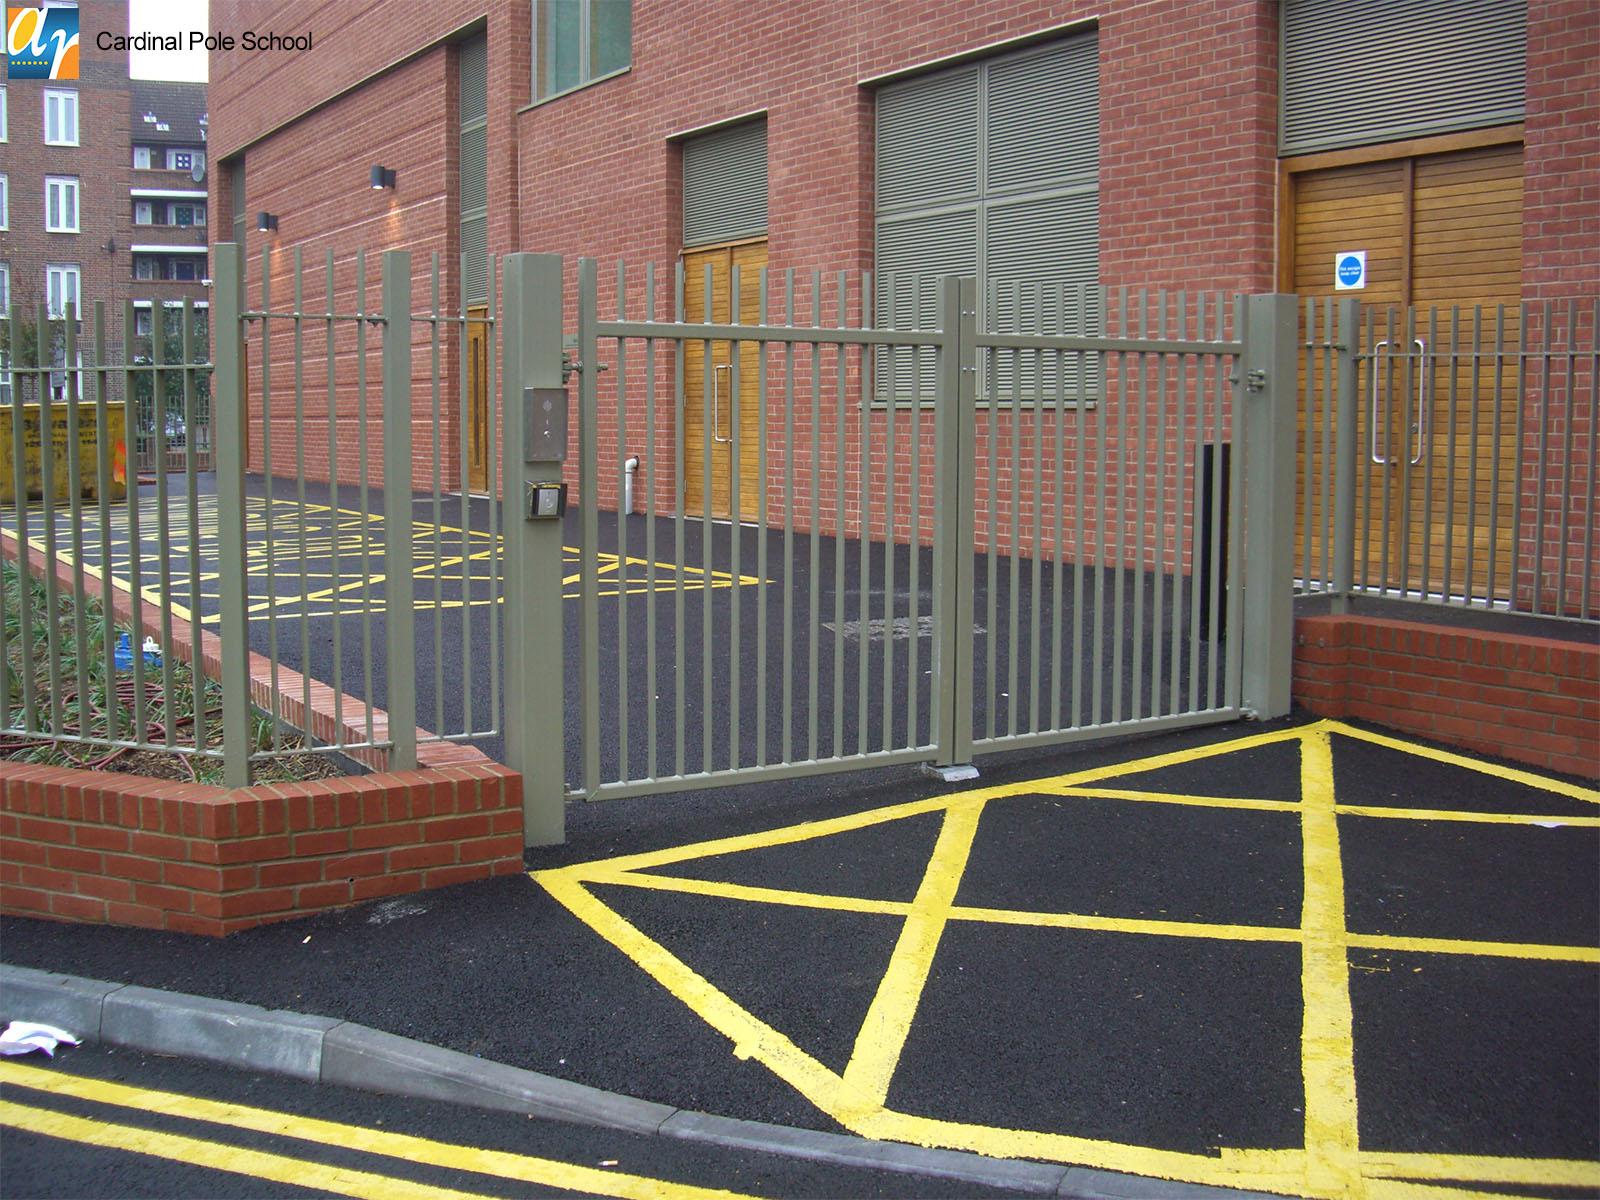 Cardinal Pole School metal gates